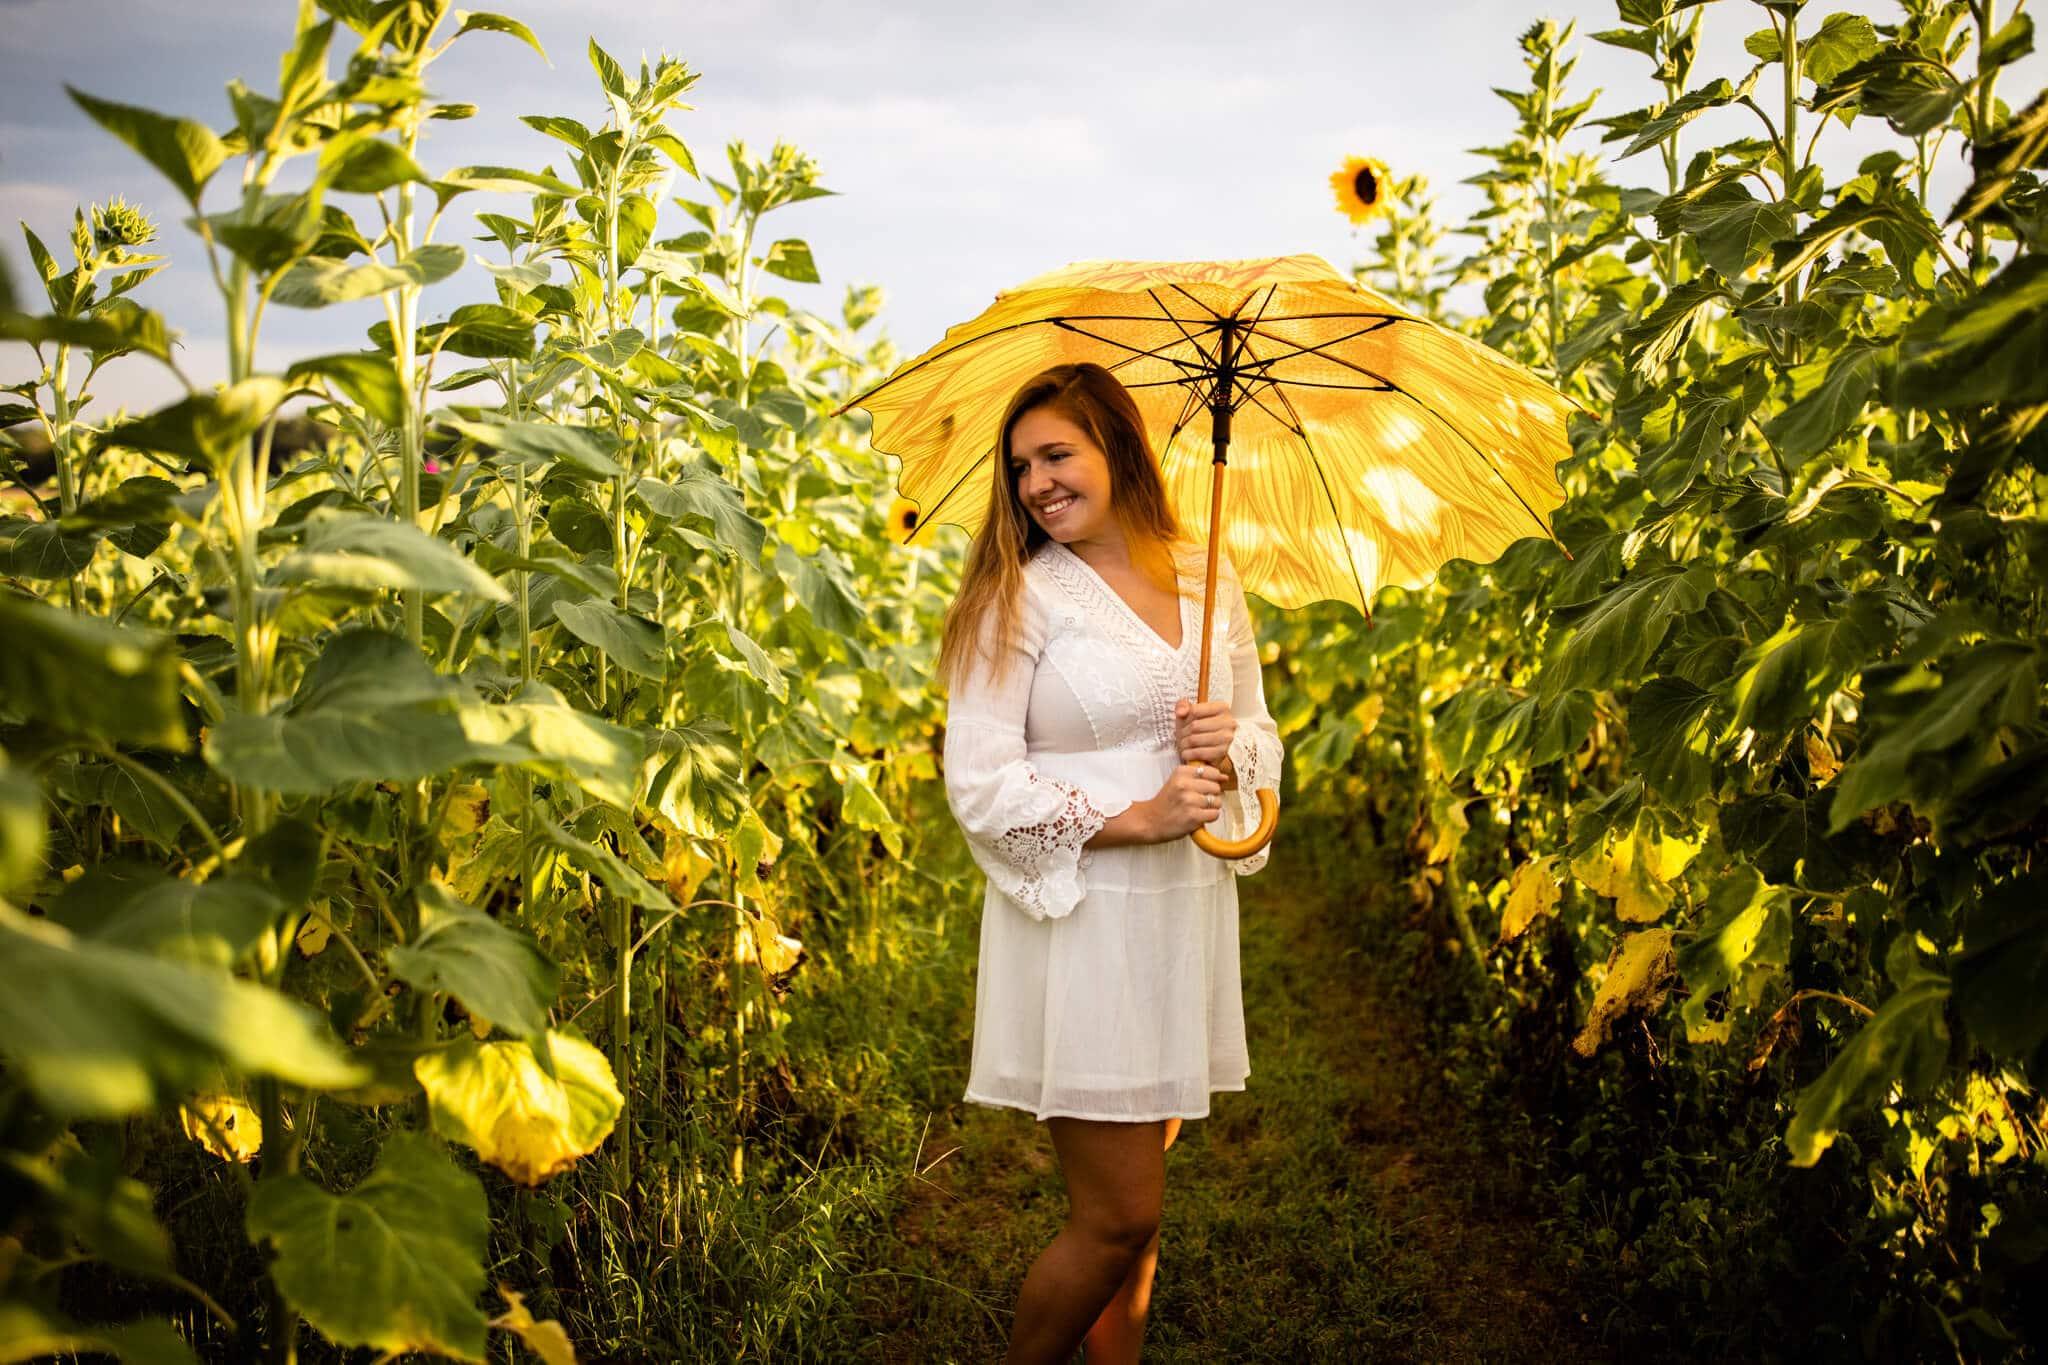 high school senior girl with sunflower umbrella in sunflower field